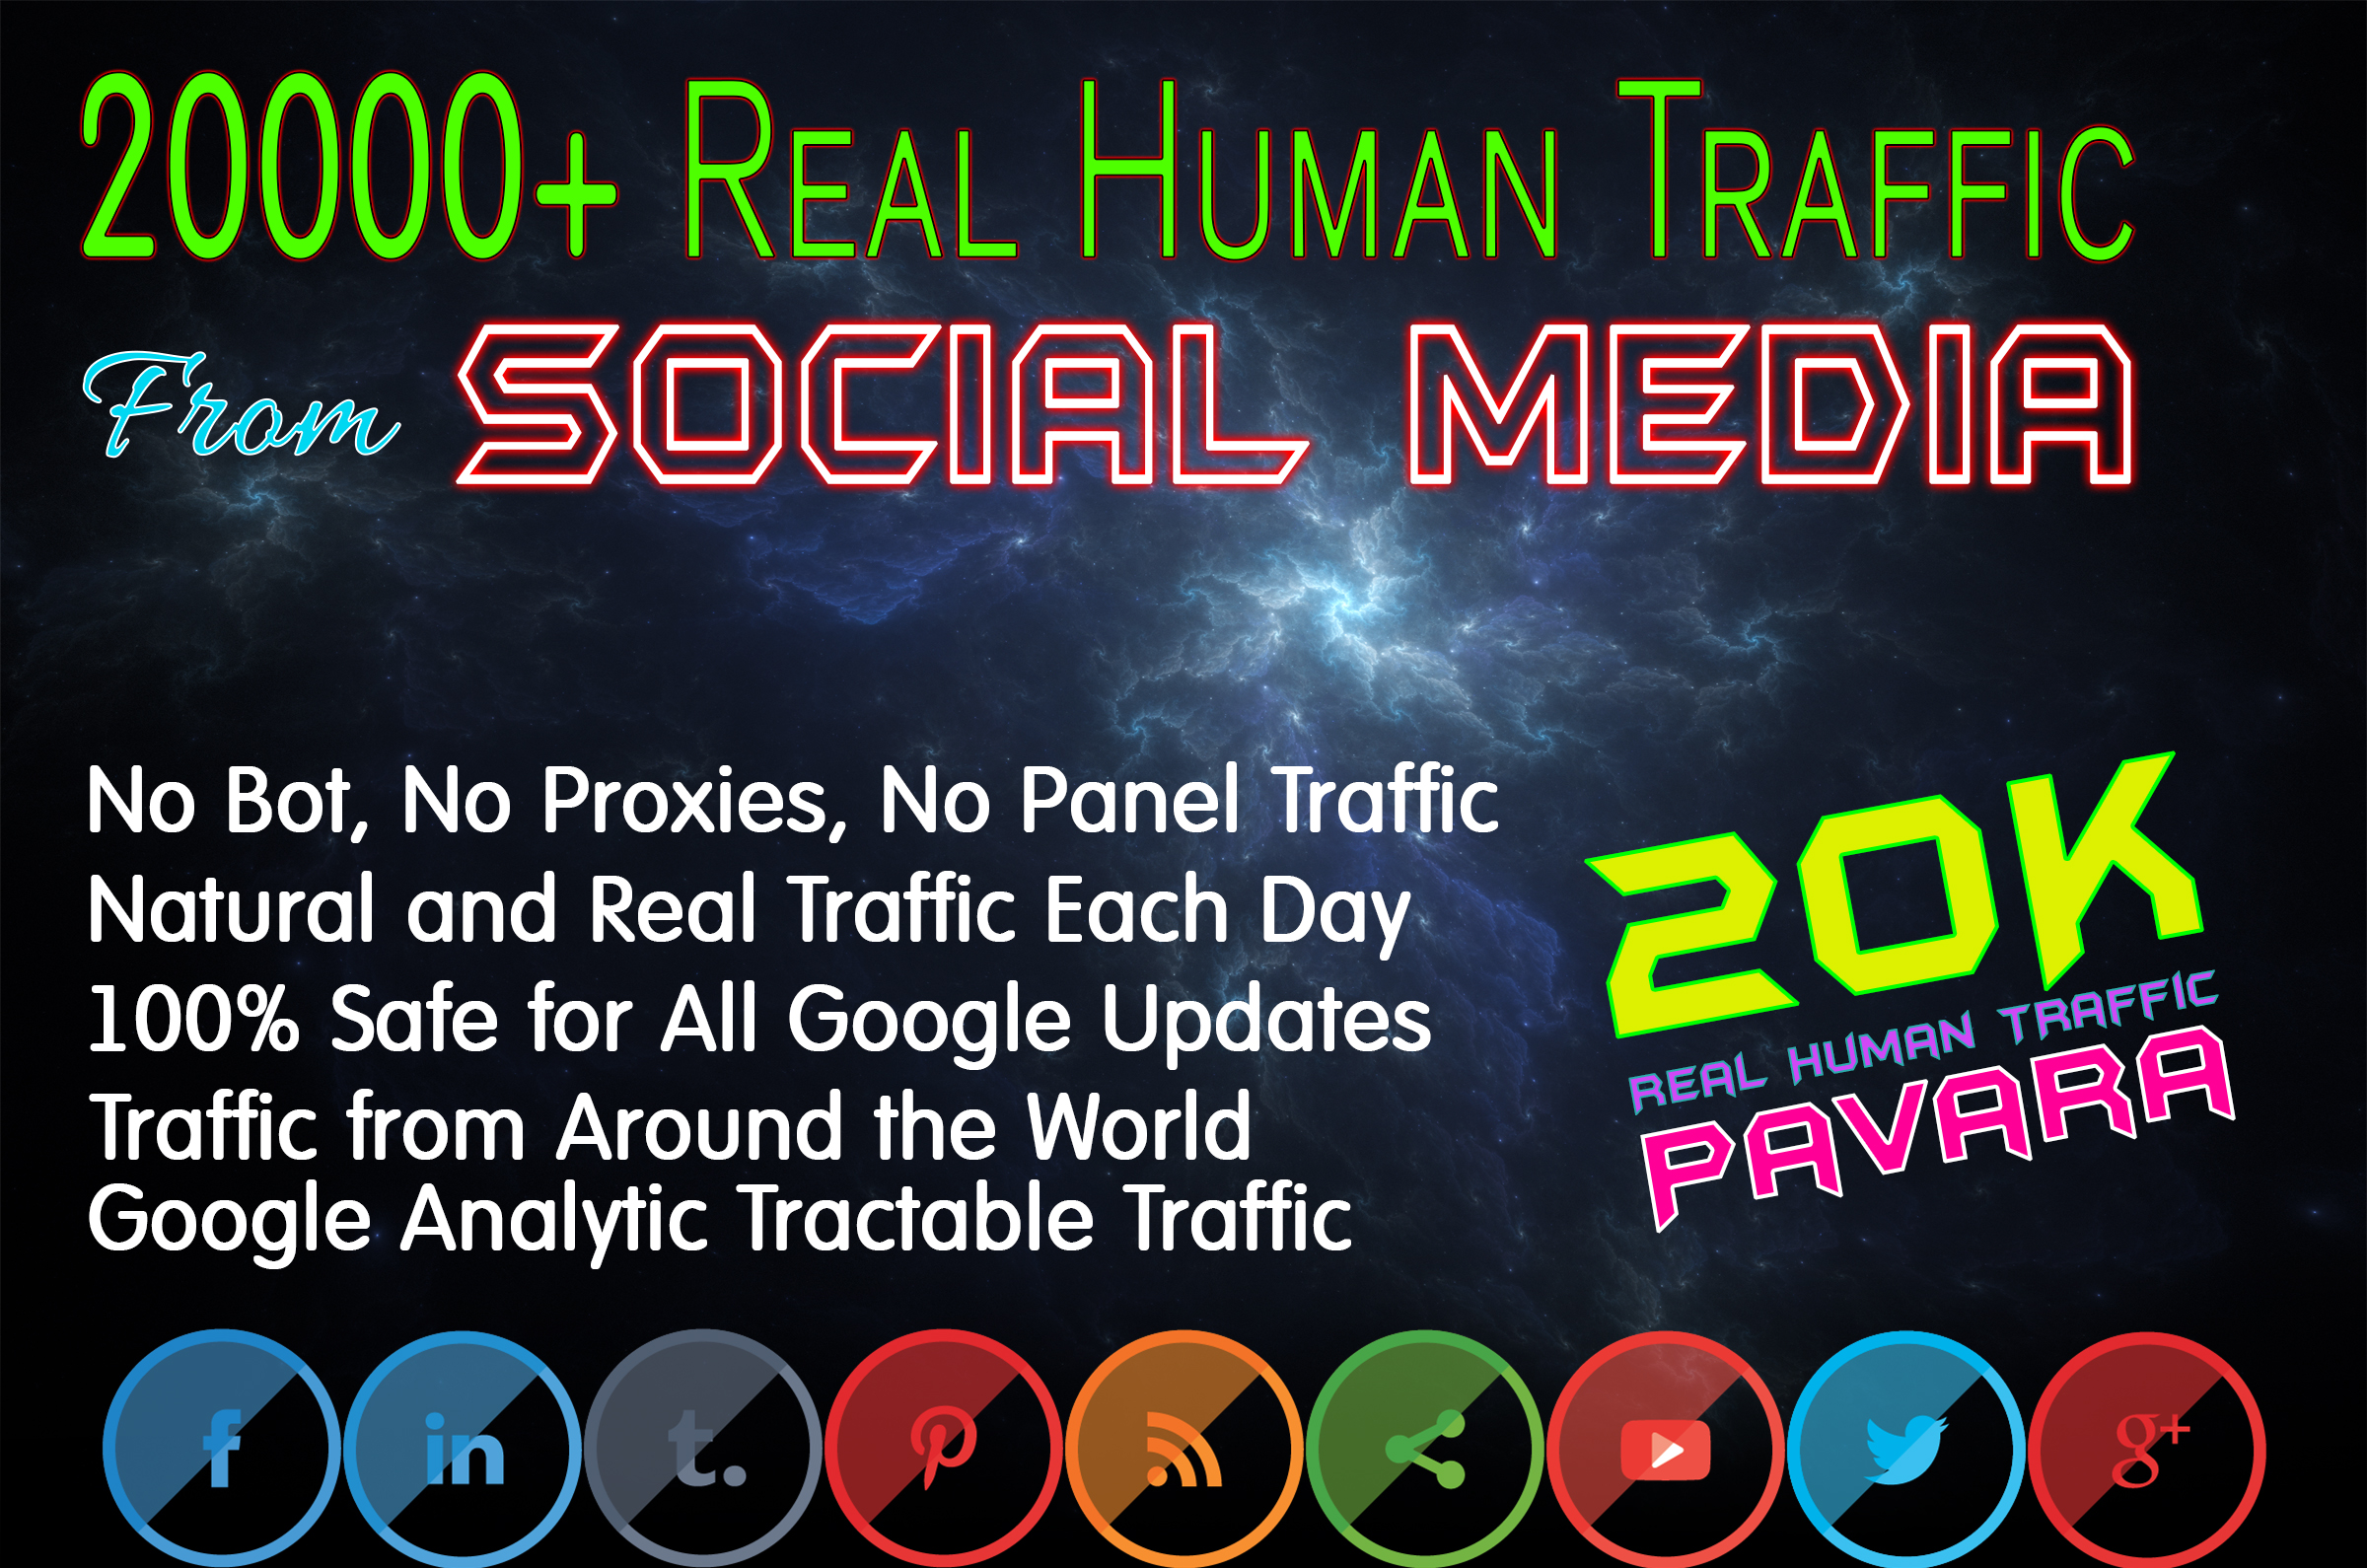 Drive 20000+ Human Web Traffic from Social Media